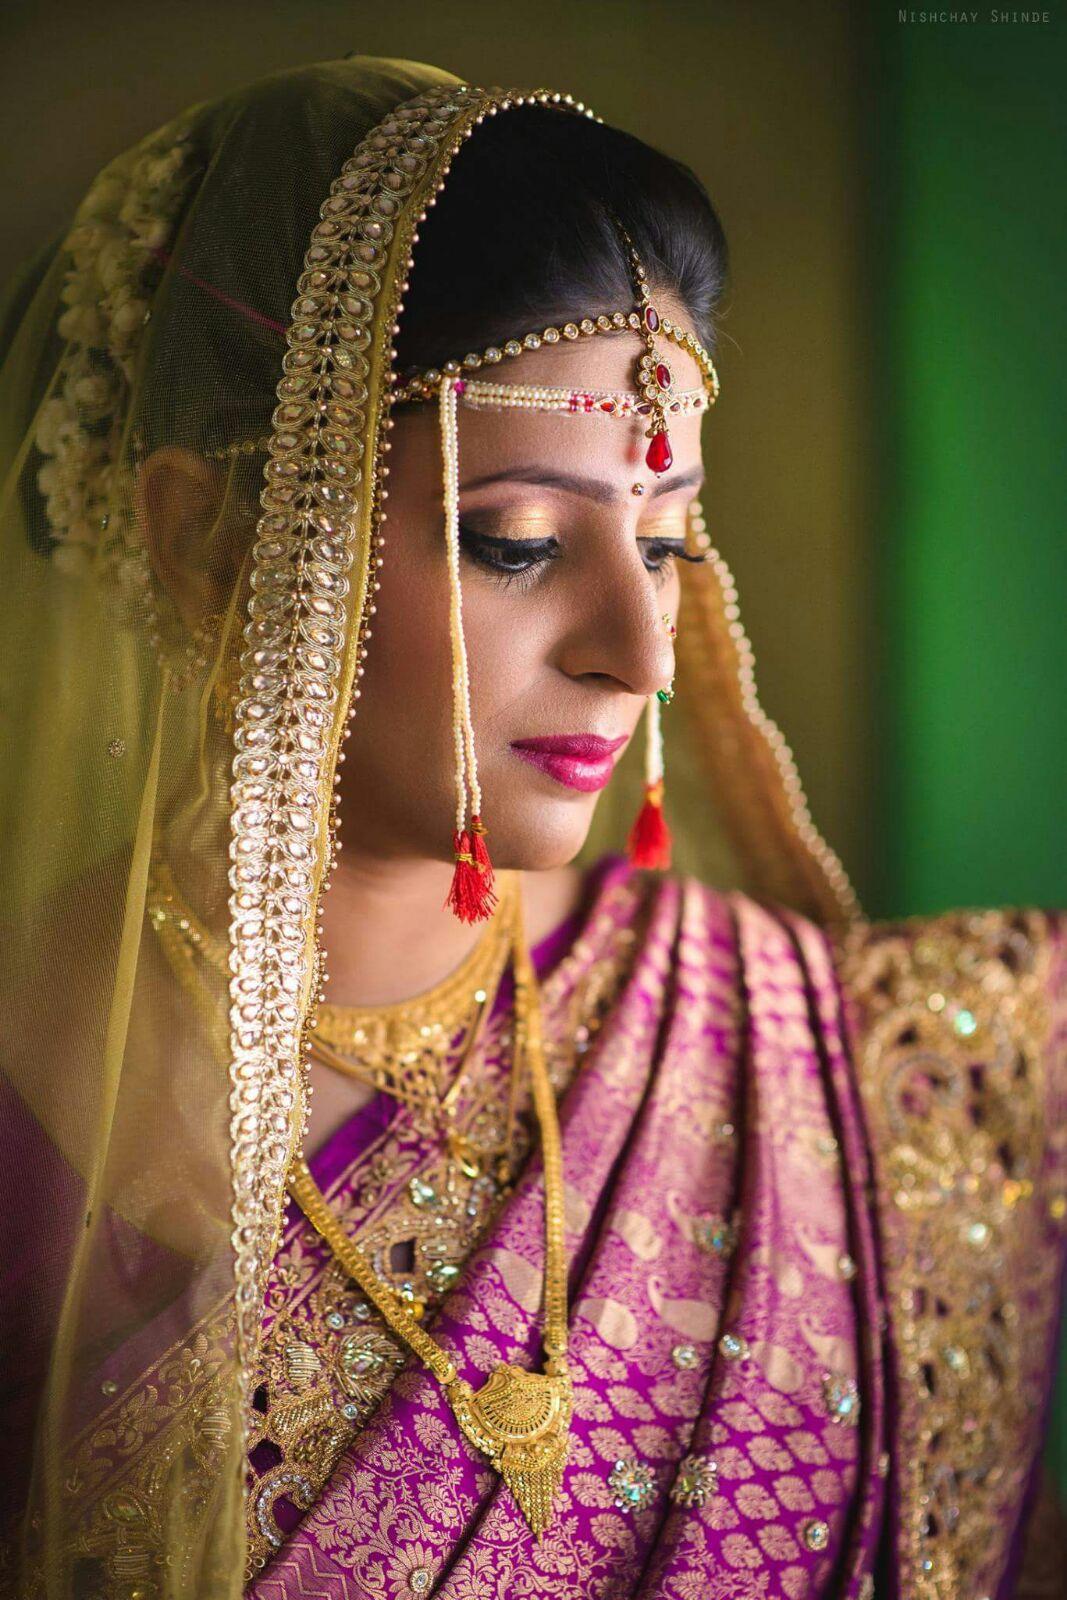 shilpi-verma-makeup-artist-pune